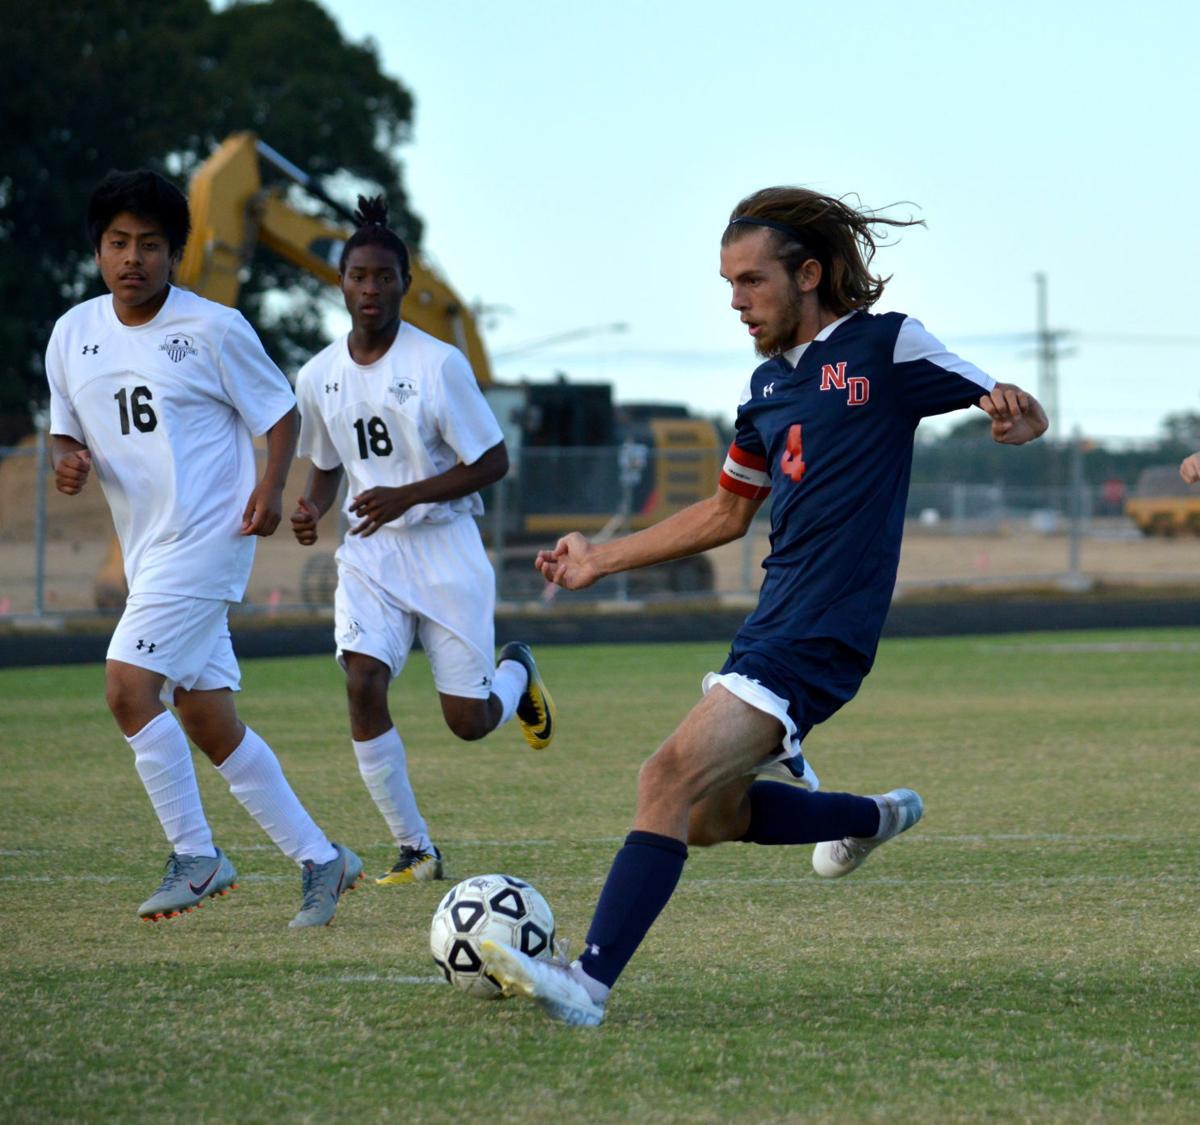 High School Soccer: Washington at North Dorchester